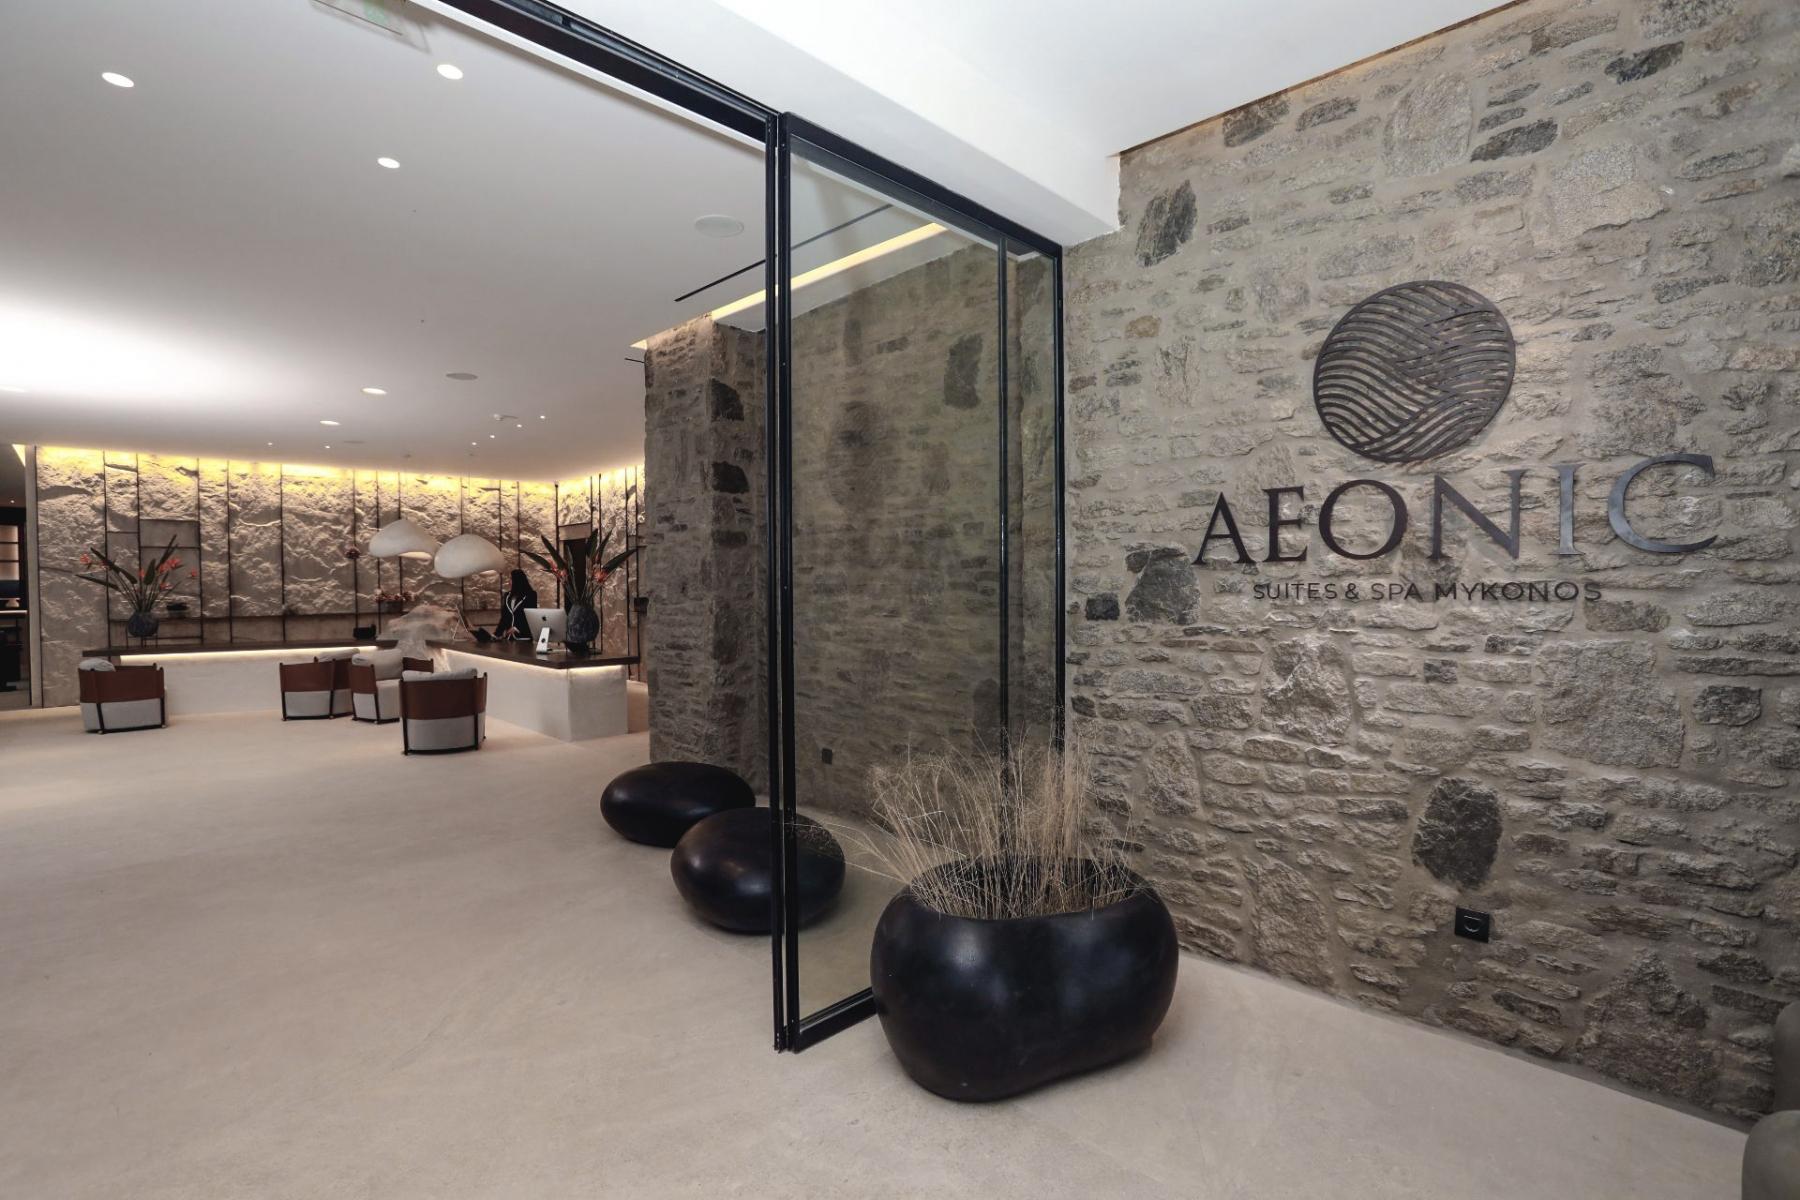 1_1_Hall-Aeonic-Suites-Spa-Interior-5